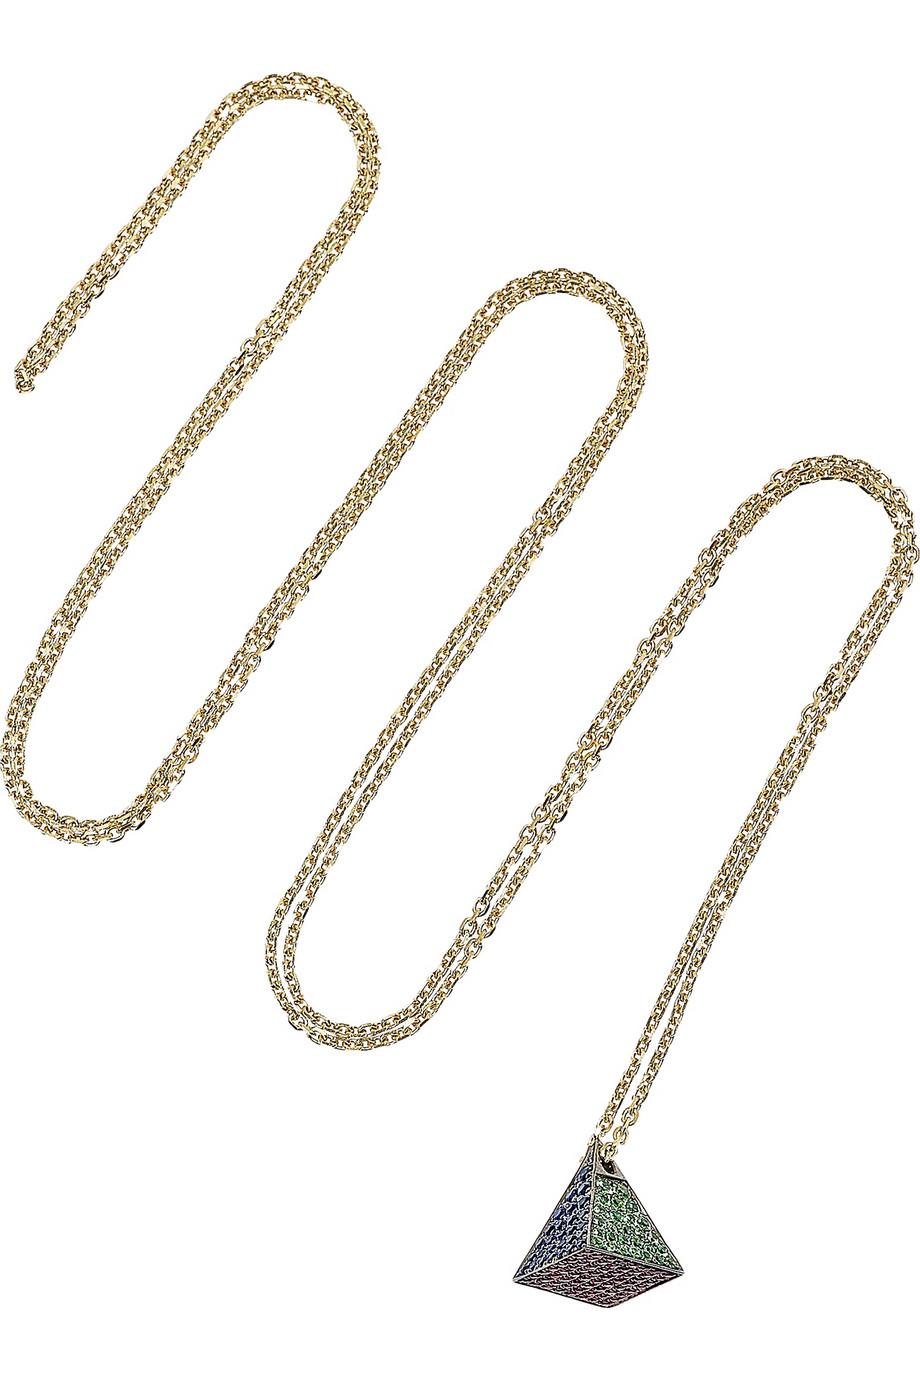 Exclusive Mala 18-karat Gray Gold Multi-stone Necklace - one size Noor Fares oIwTk47t